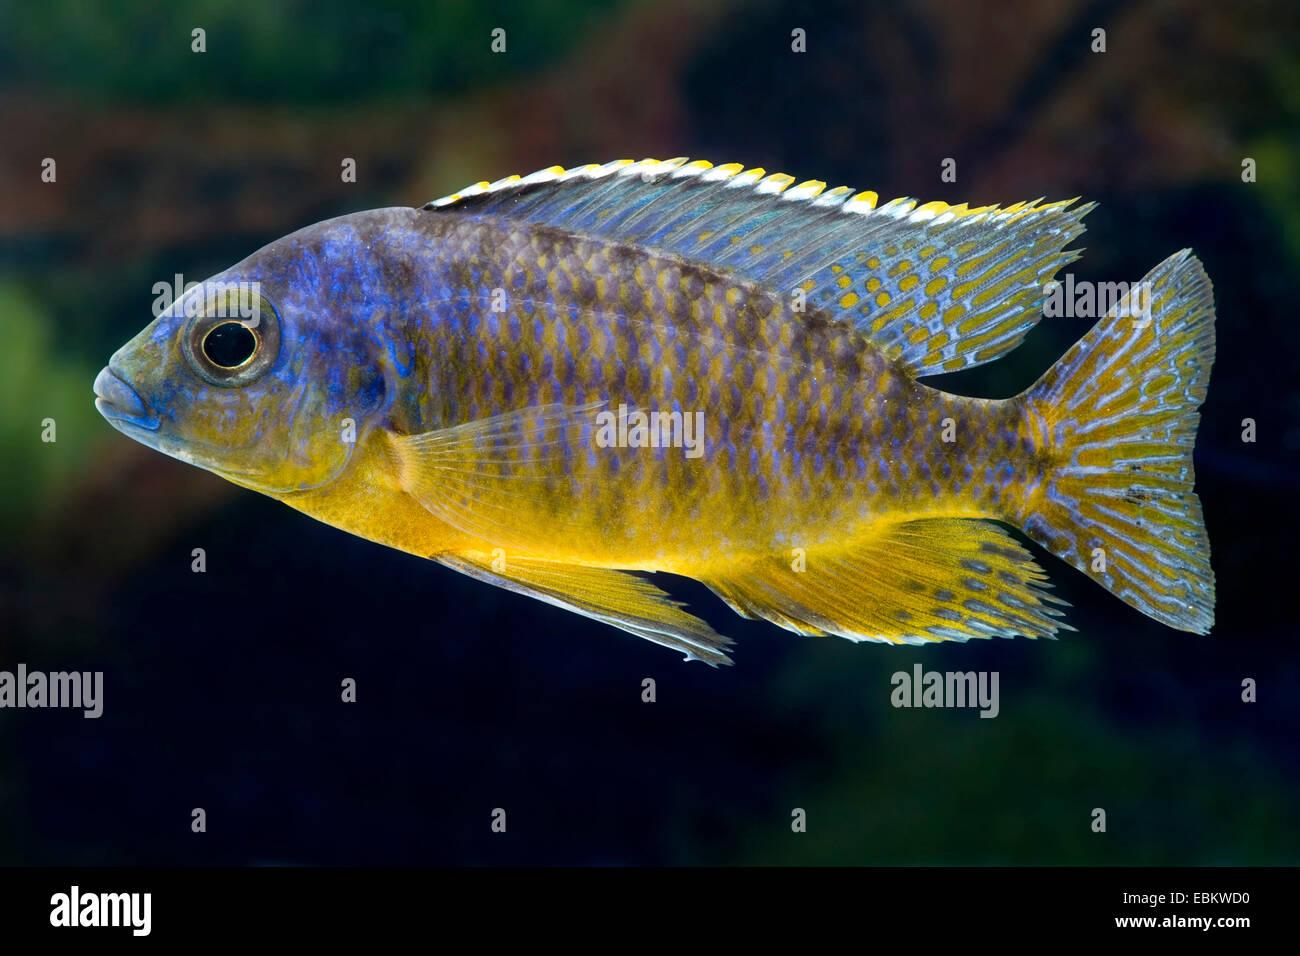 Malawi Cichlid (Protomelas virgatus), retrato de longitud completa Imagen De Stock